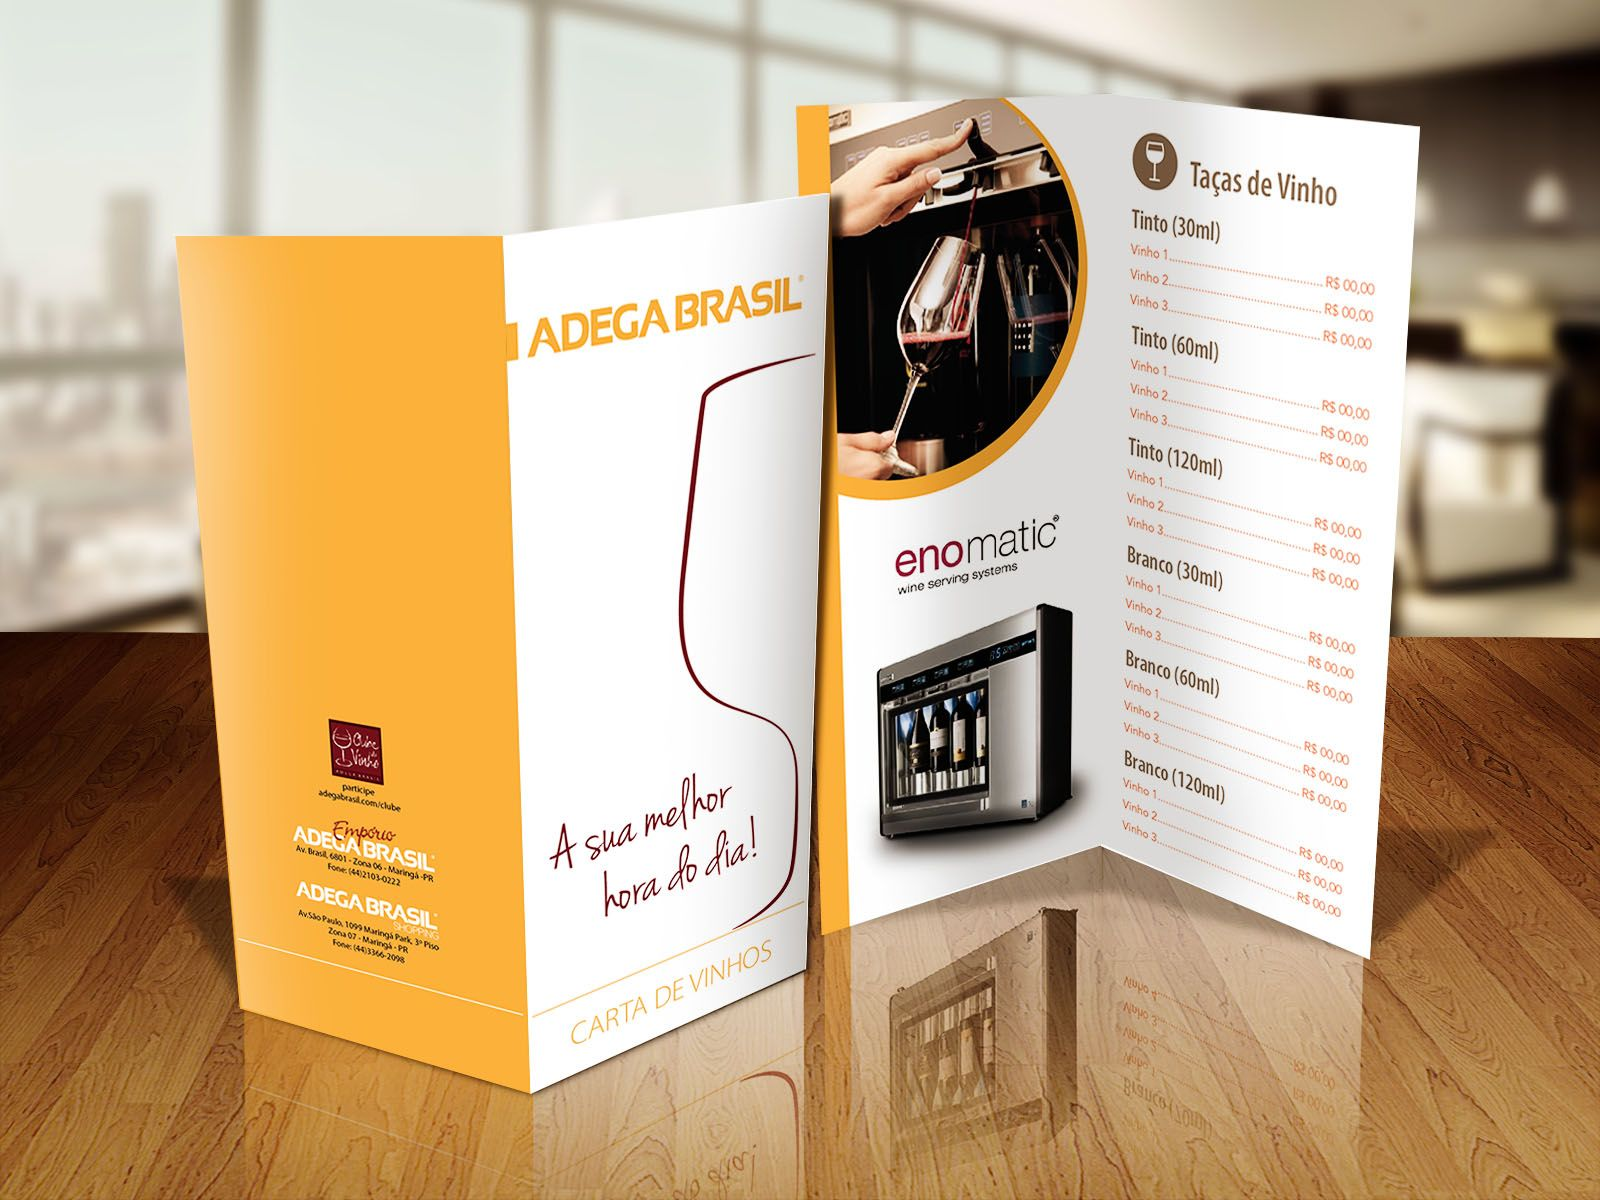 Carta de vinhos - Adega Brasil.